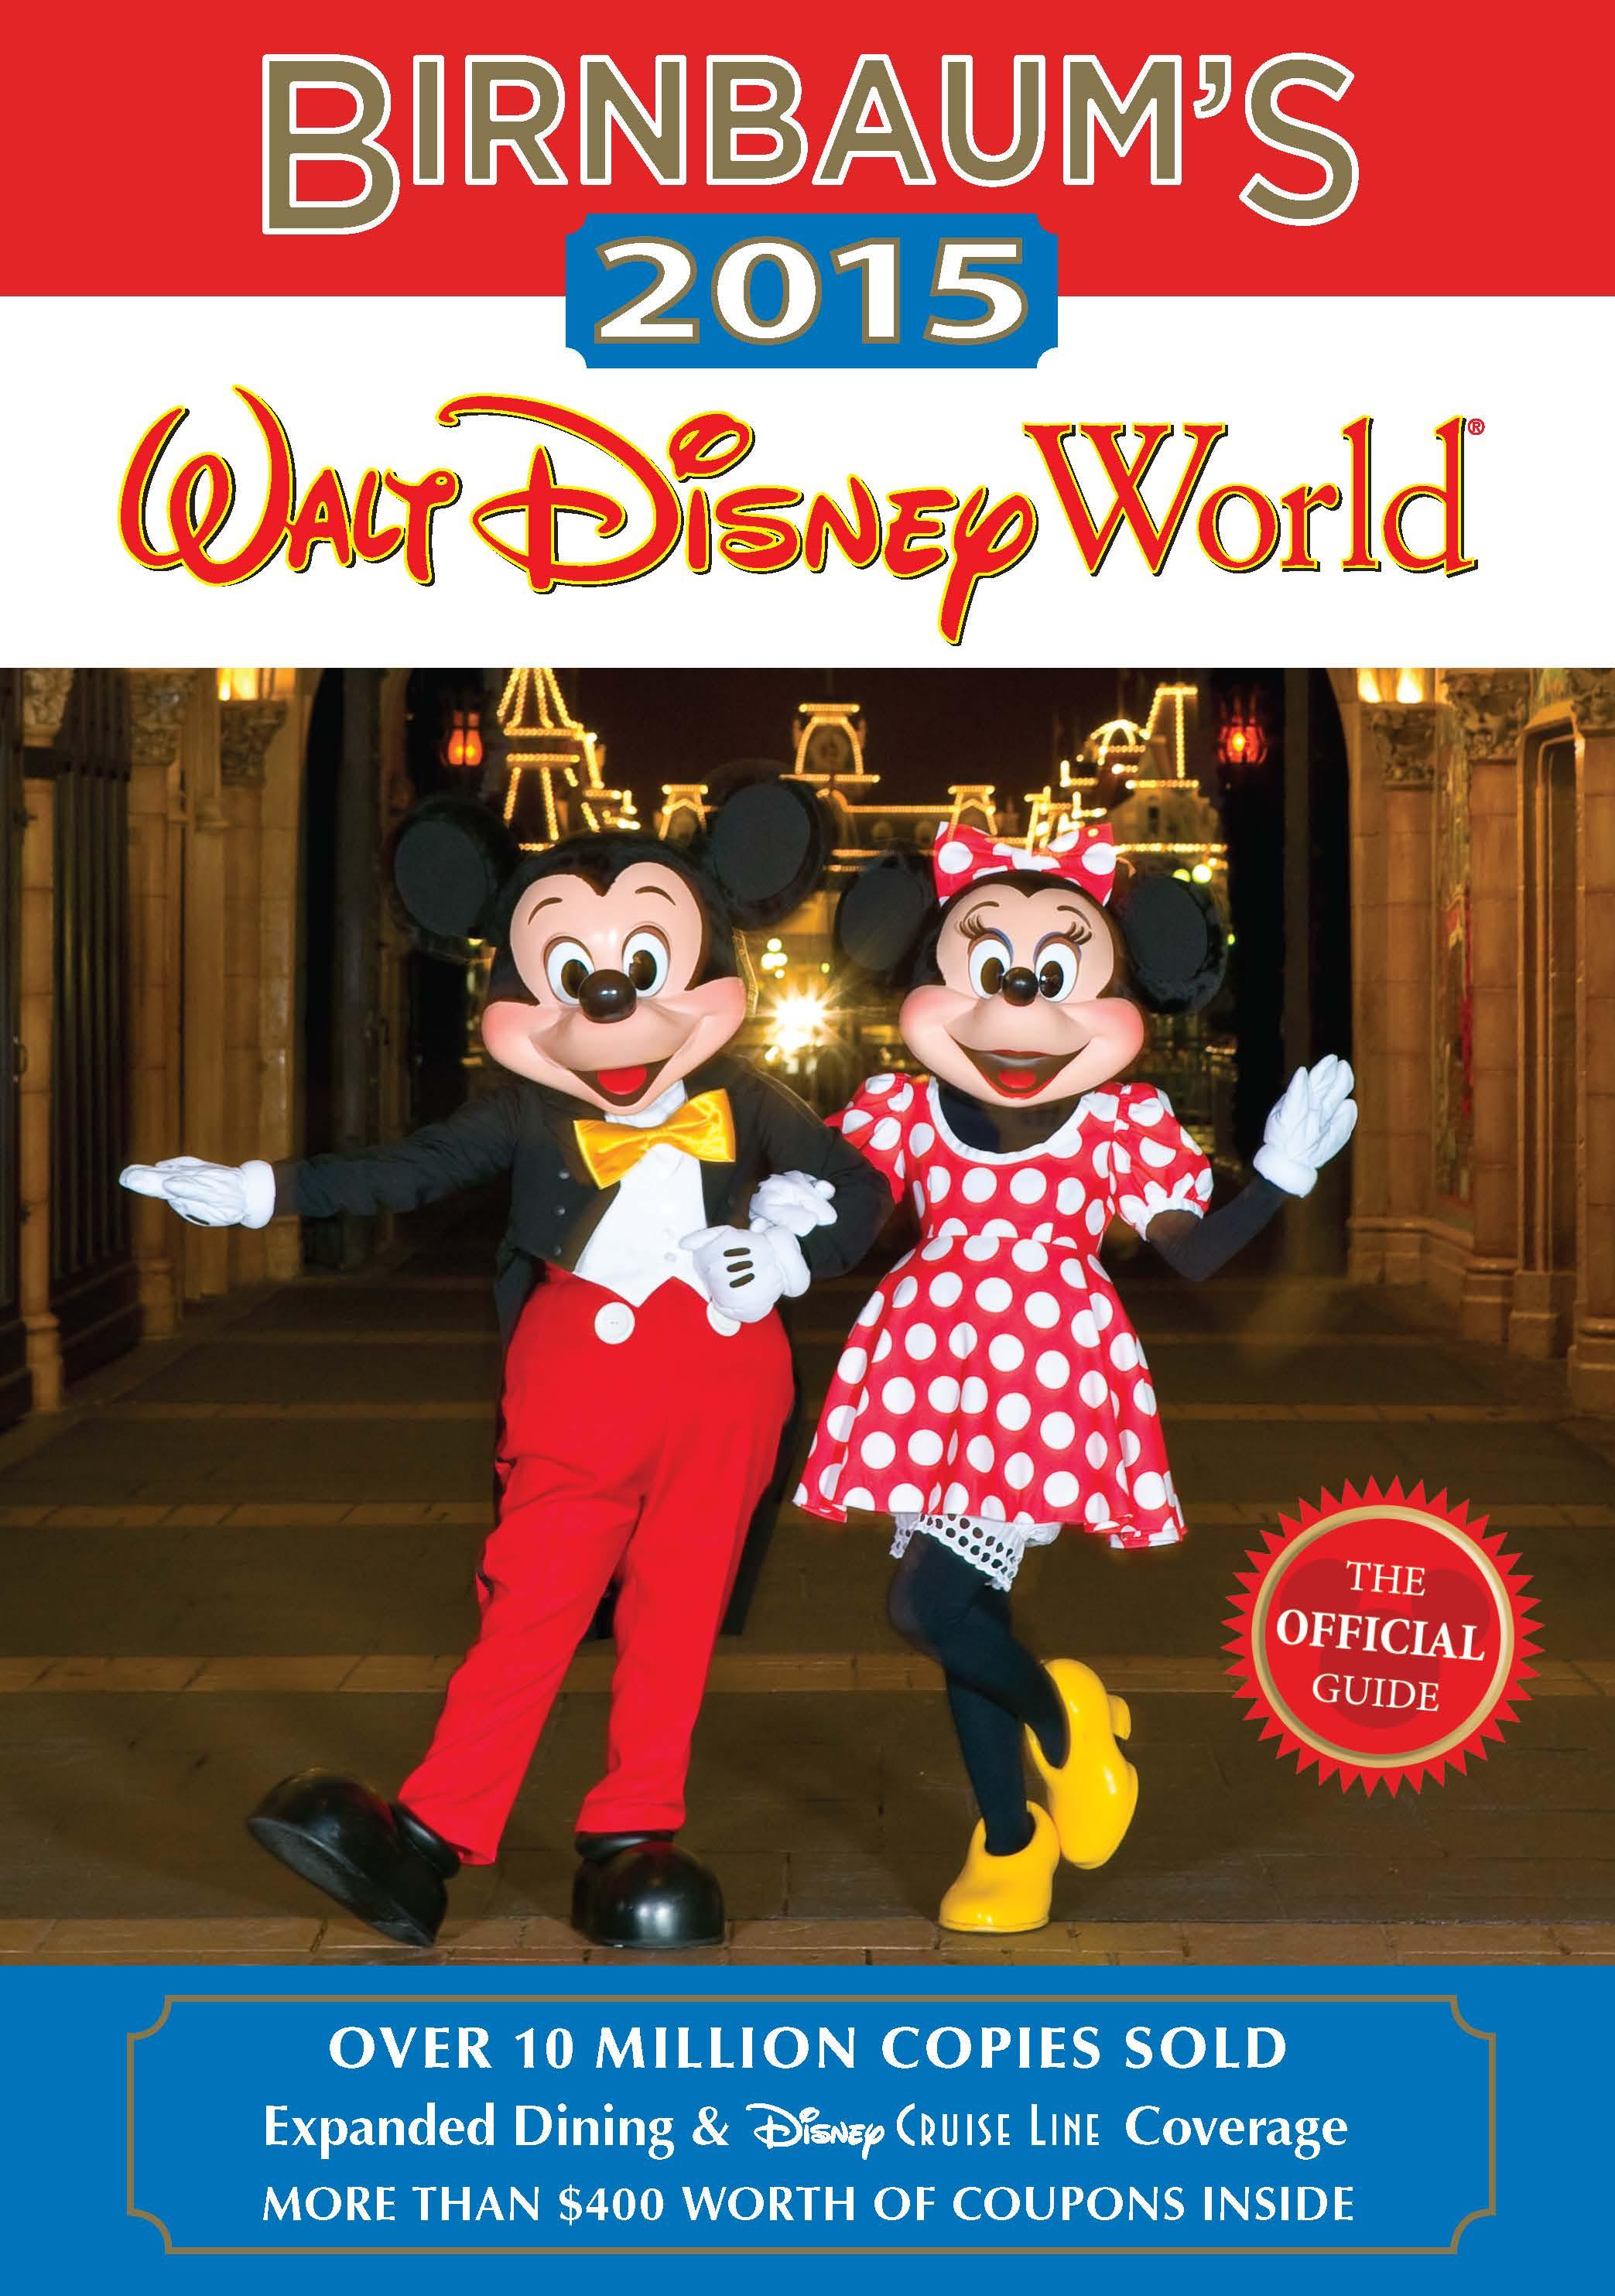 Birnbaum's 2015 Walt Disney World